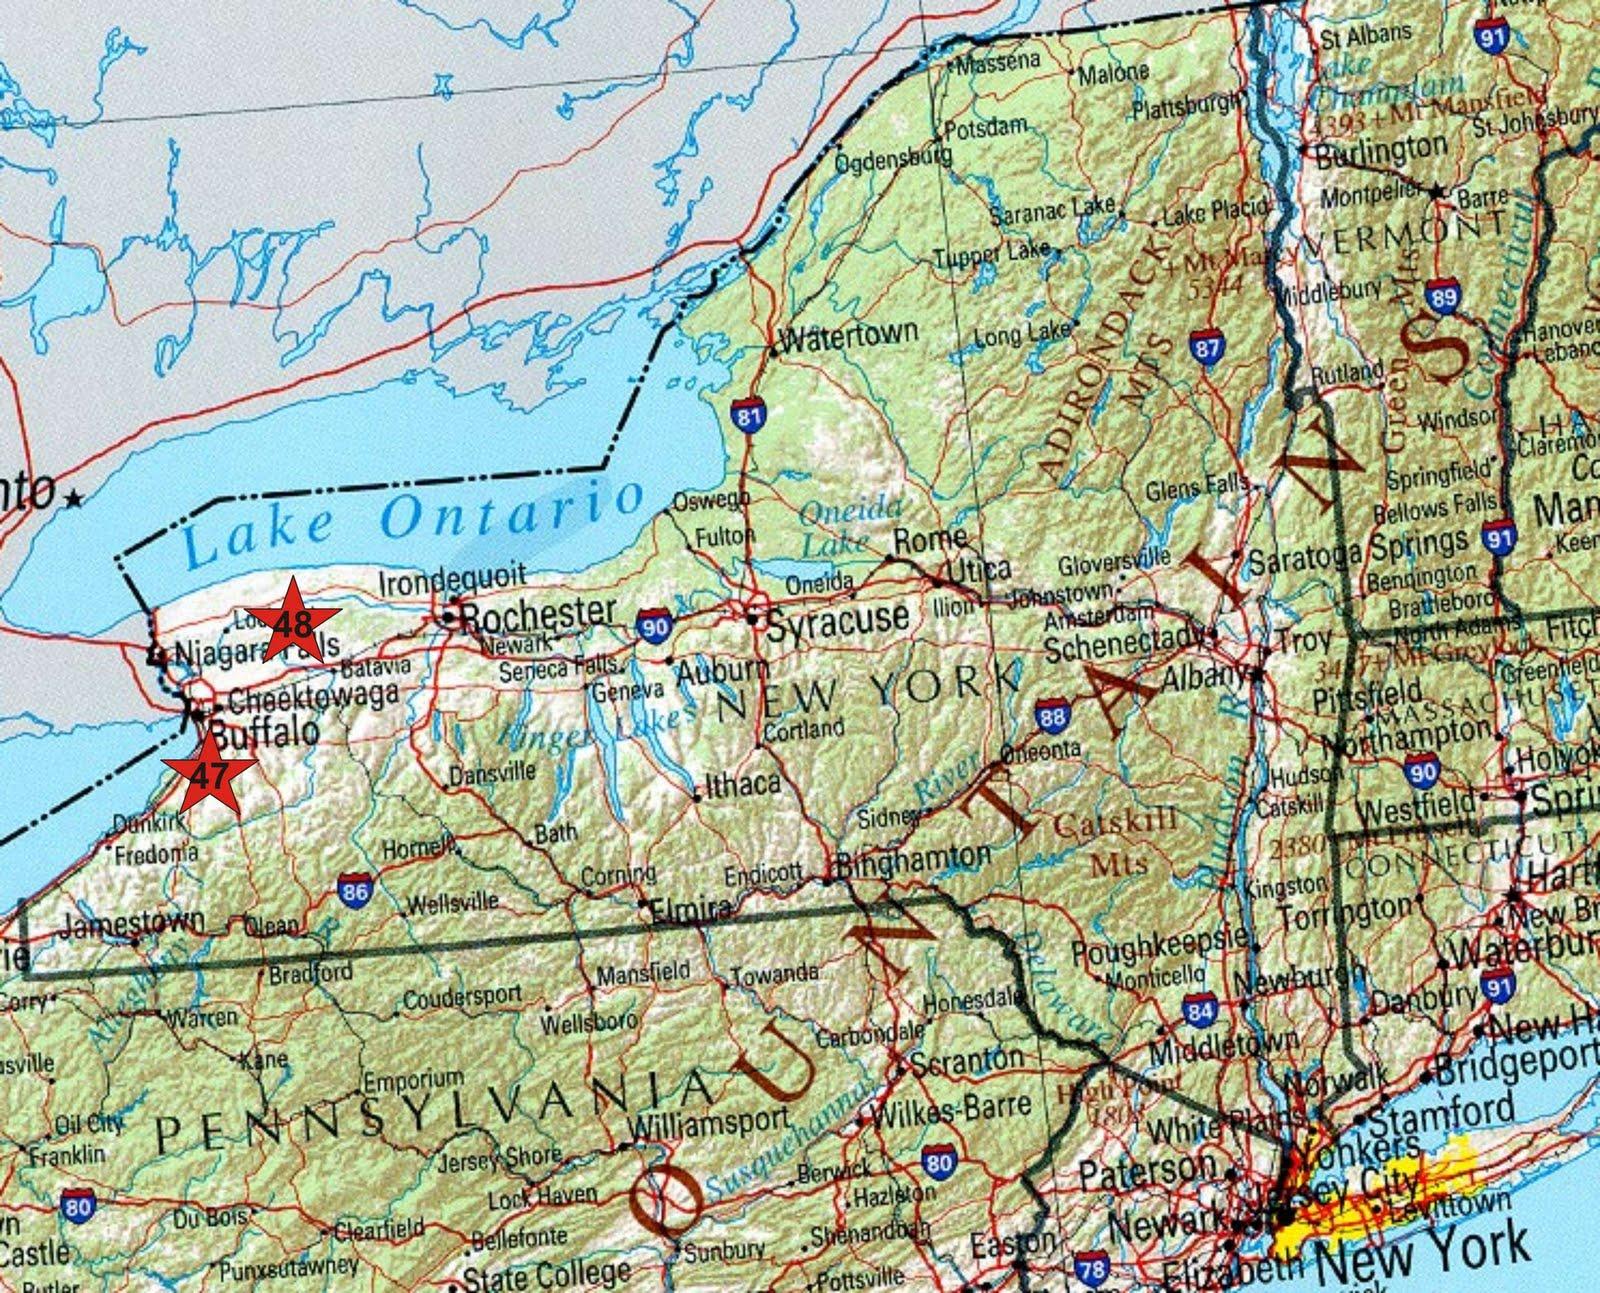 Comfort Inn Niagara Falls New York Comfort Inn The Pointe